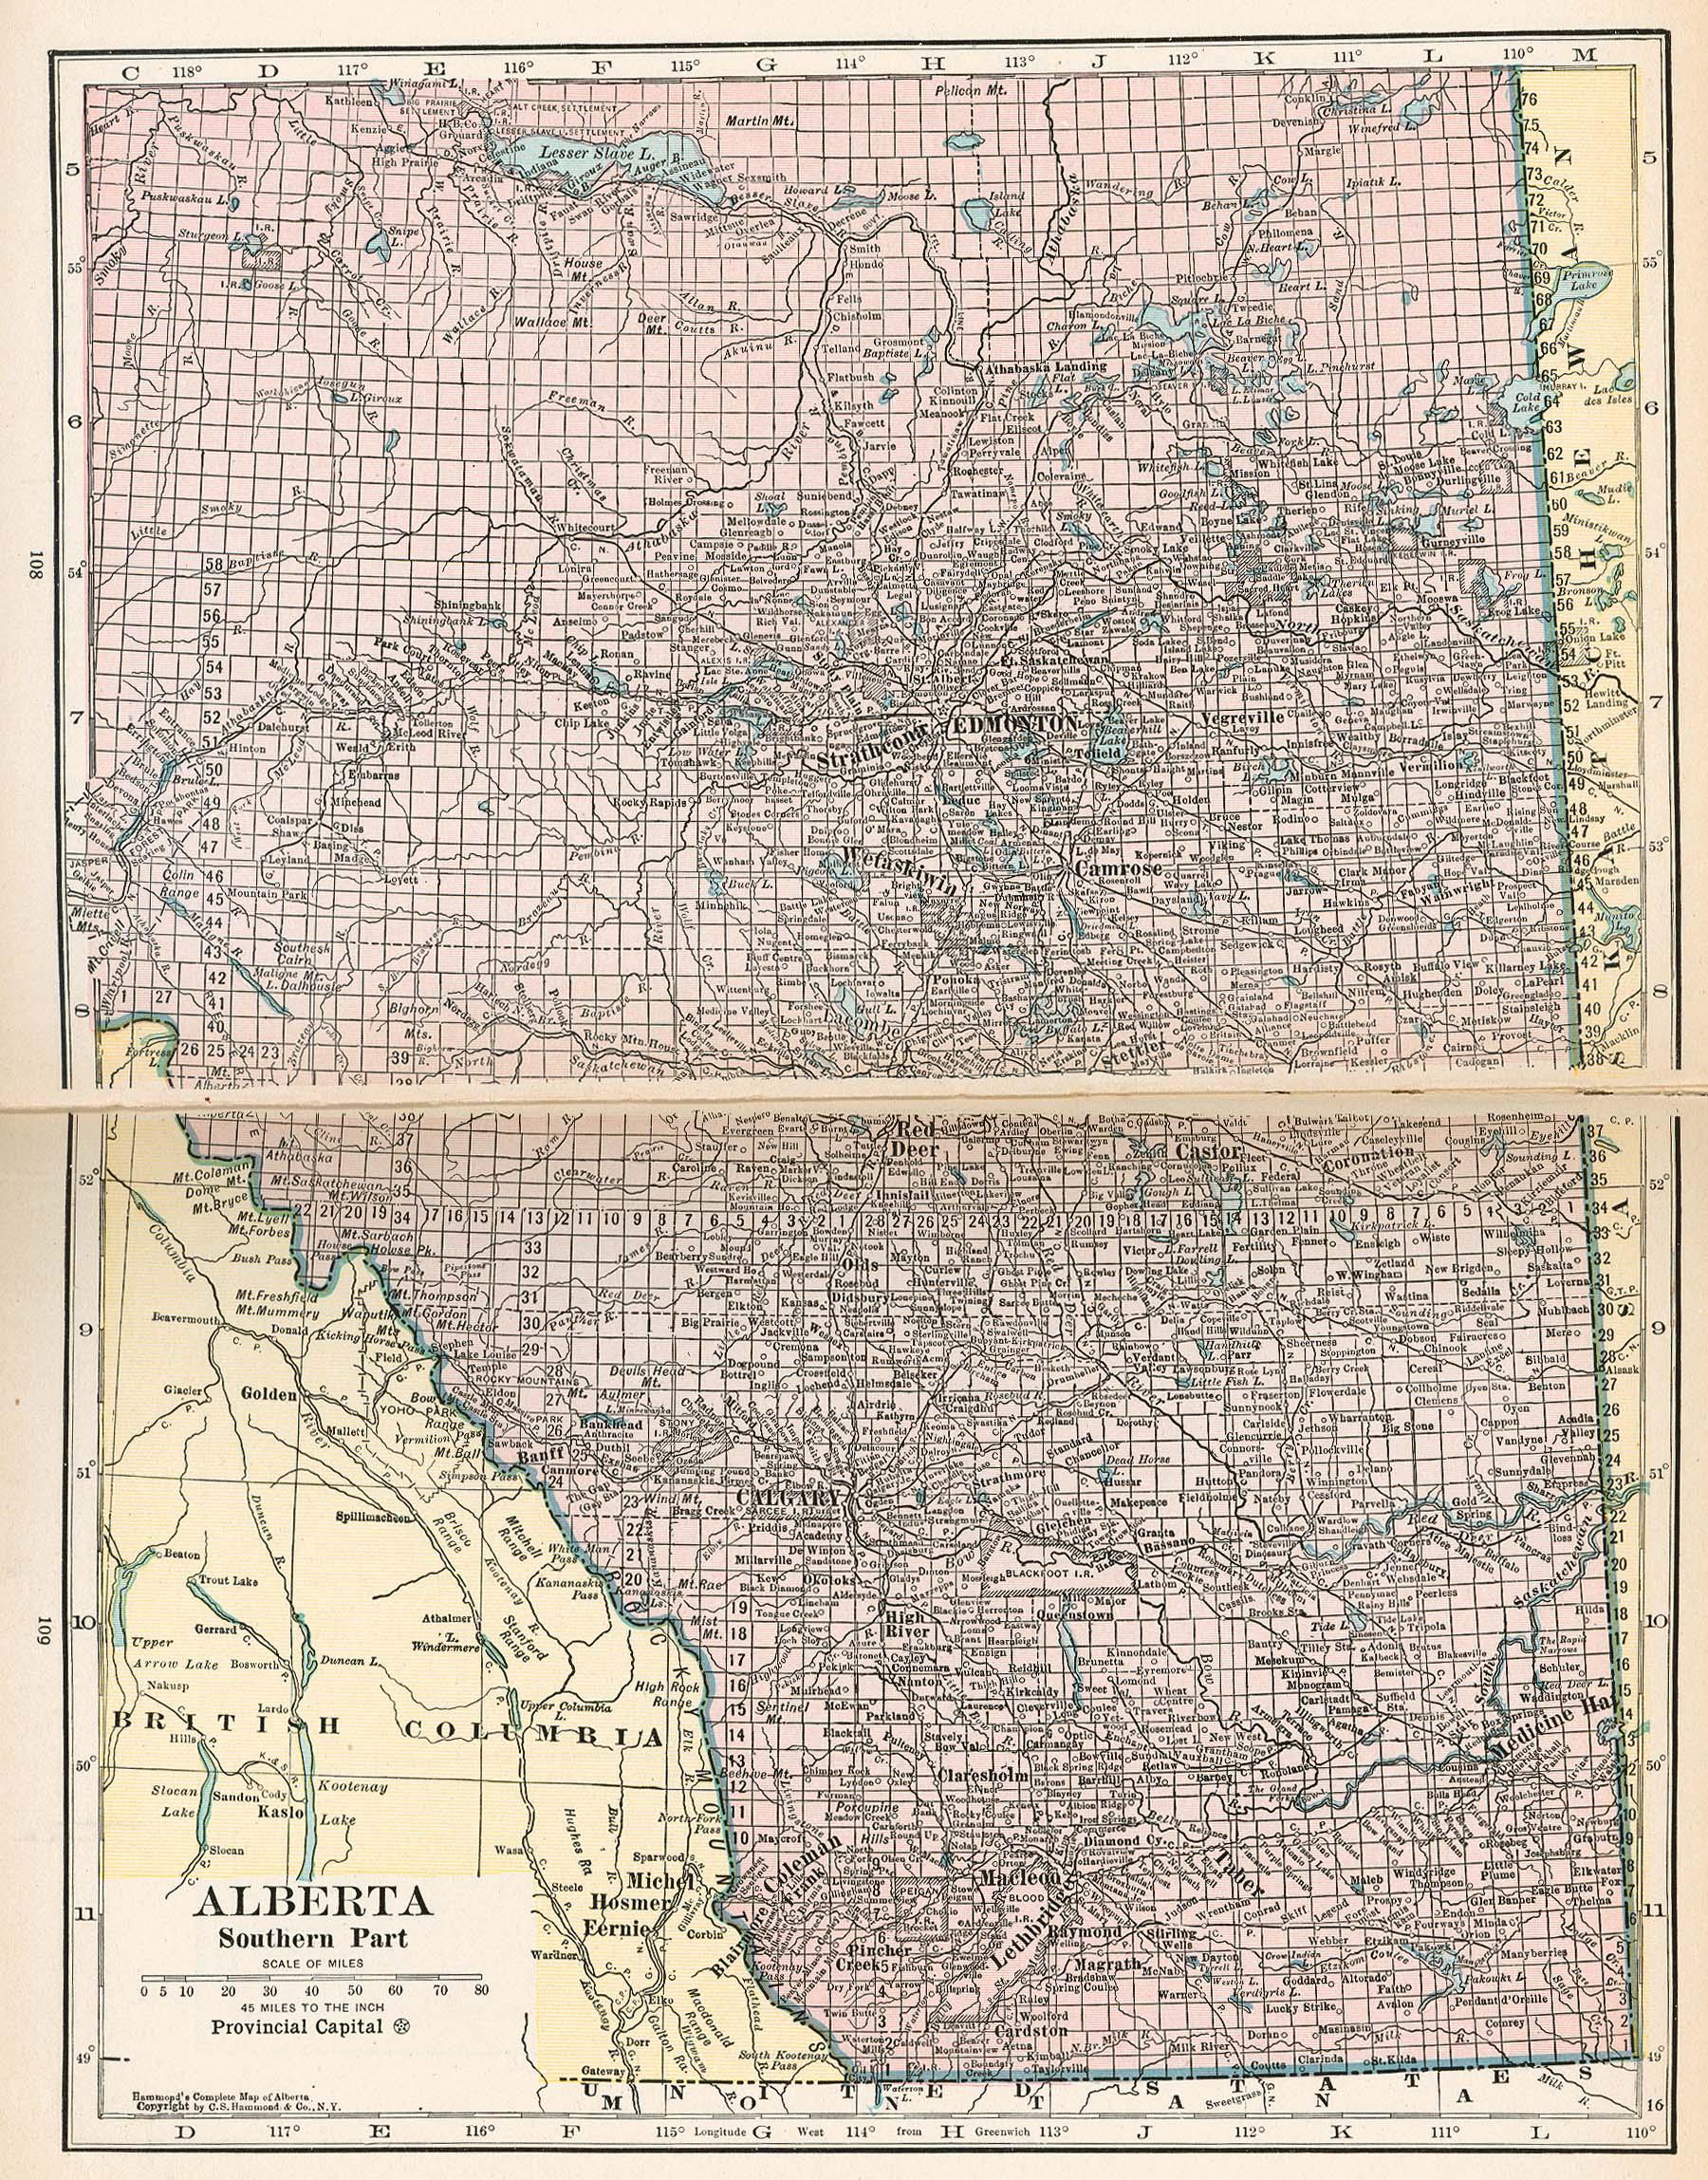 1921 map of Alberta - Canadian GIS & Geomatics Map Of Alberta on map of british columbia, map of banff national park, map of saskatchewan, map of ab, map of toronto, map of lesser slave lake, map of england, map of illinois, map of china, map of arizona, map of calgary, map of russia, map of us, map of ontario, map of cuba, map of mississippi, map of quebec, map of maine, map of nunavut, map of canadian rockies, map of bc, map of world, map of usa, map of new york, map of switzerland, map of delaware, map of vancouver, map of alaska, map of manitoba, map of europe, map canada, map of greece, map of victoria, map of yukon, map of indiana, map of north america, map of nova scotia,